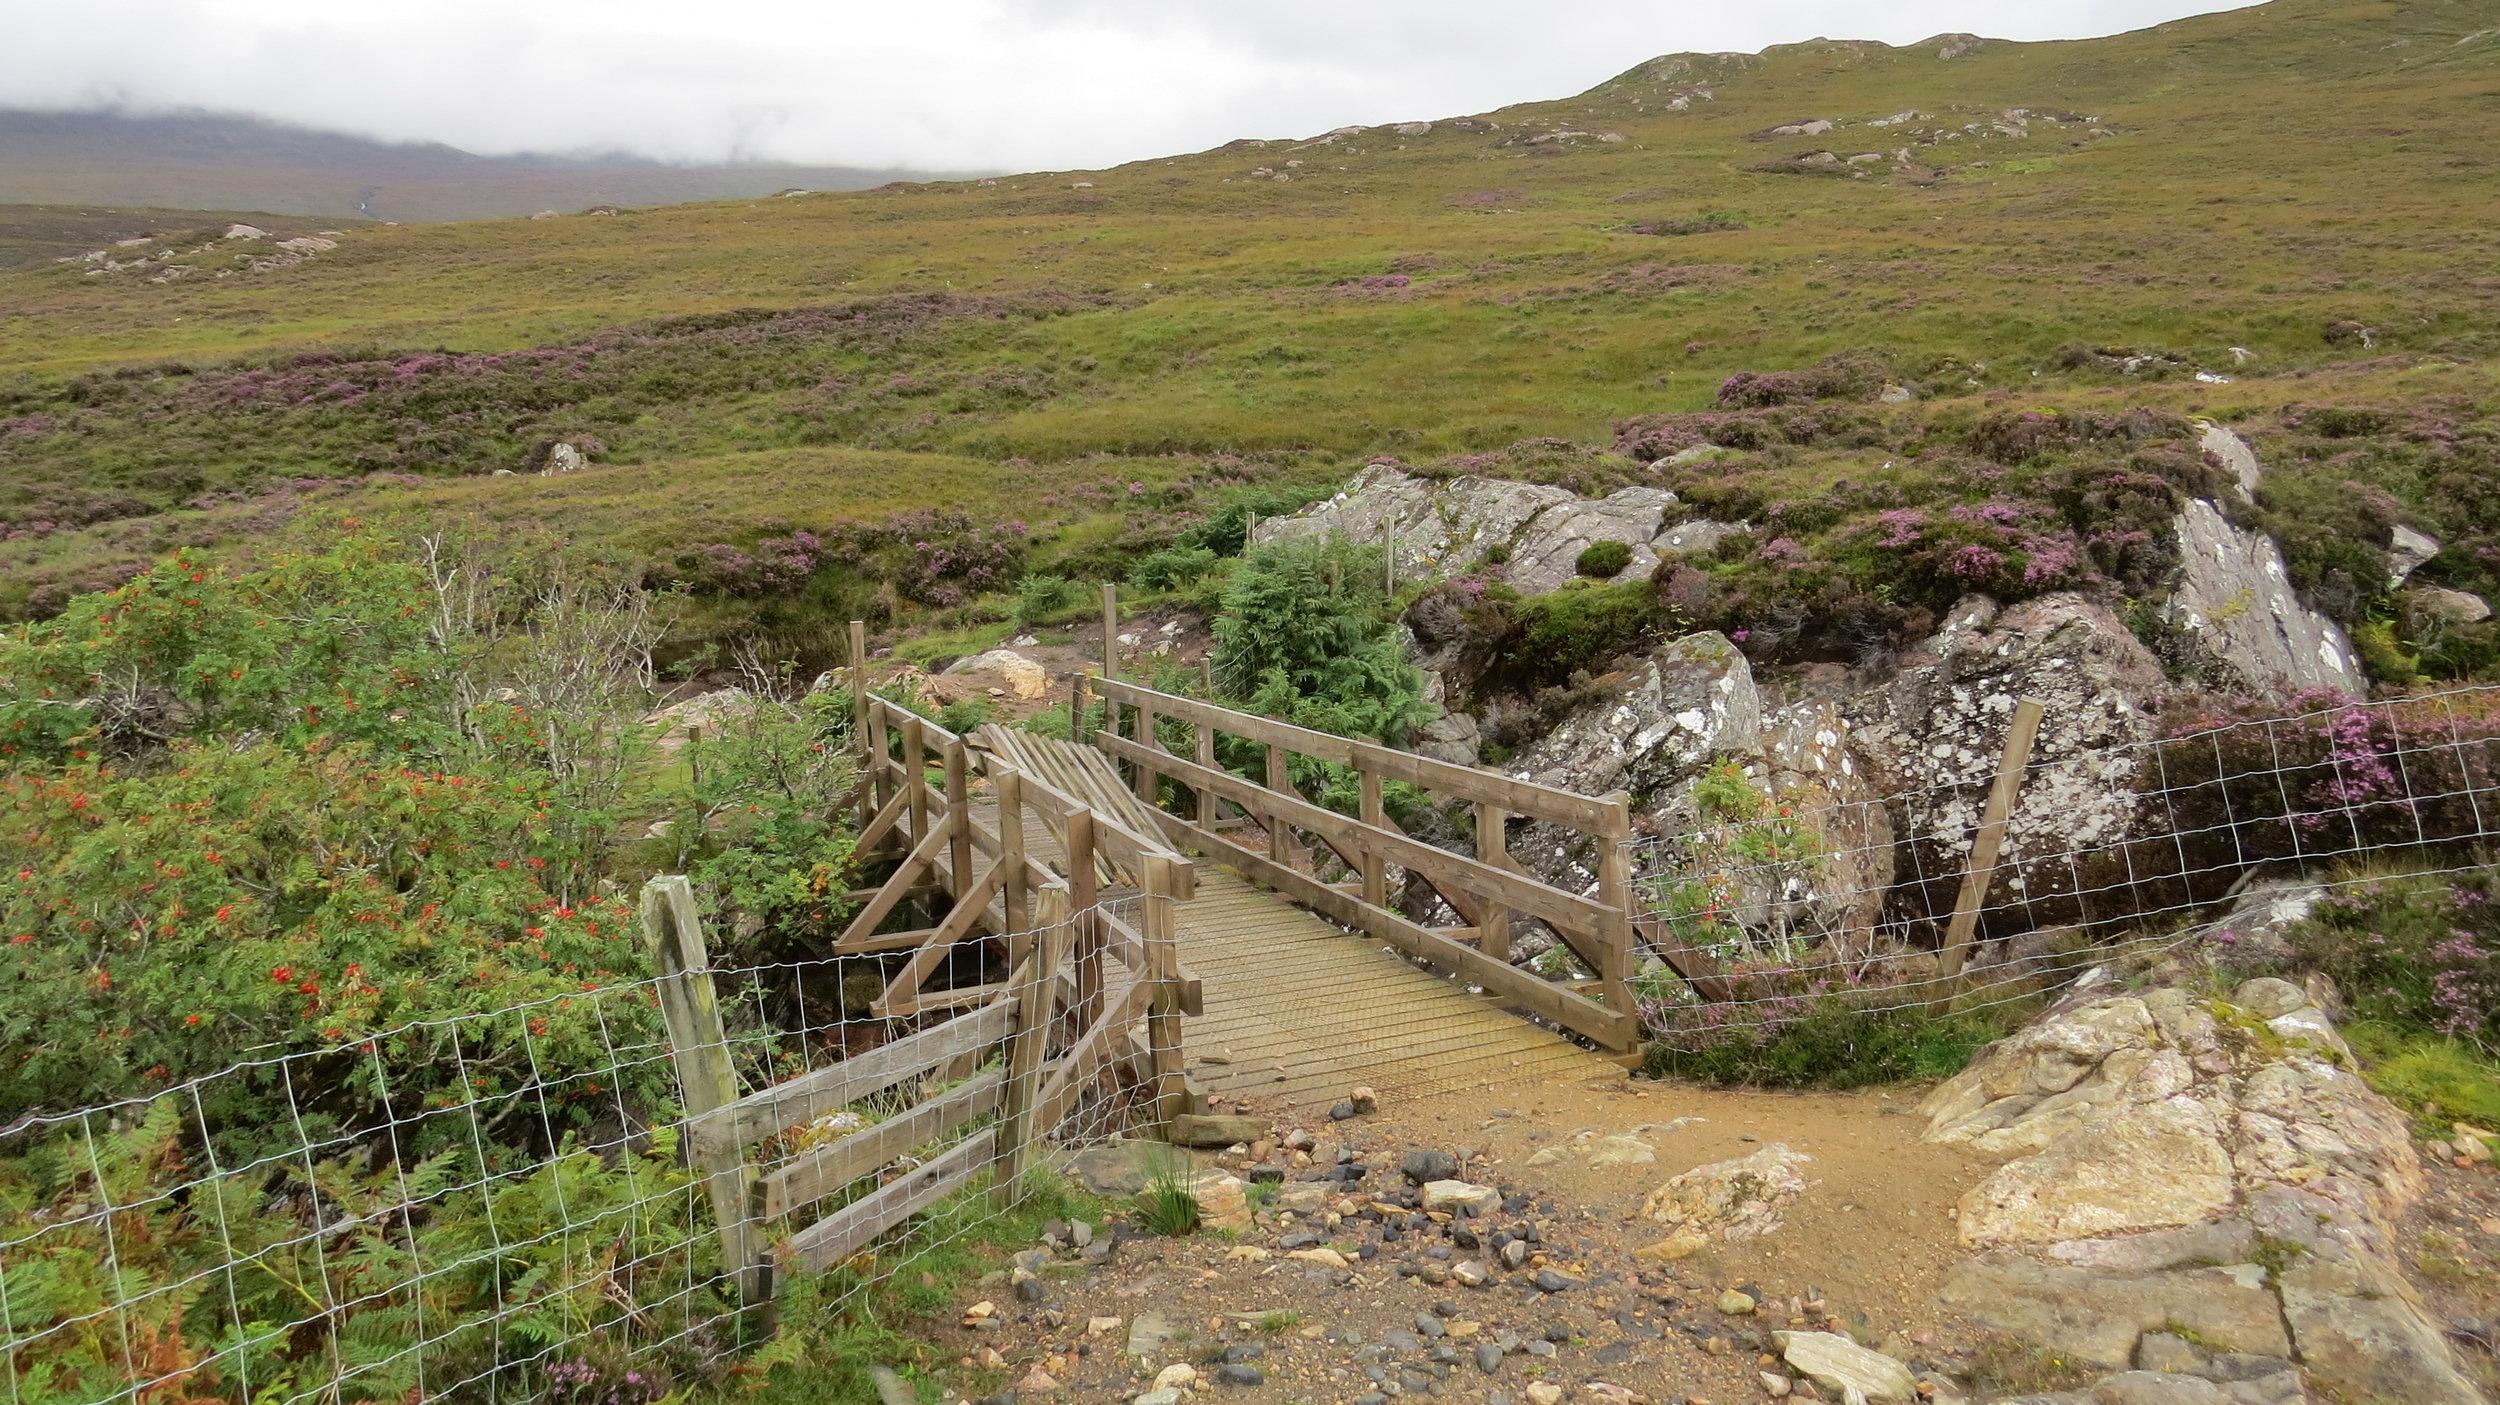 The Footbridge Exists!